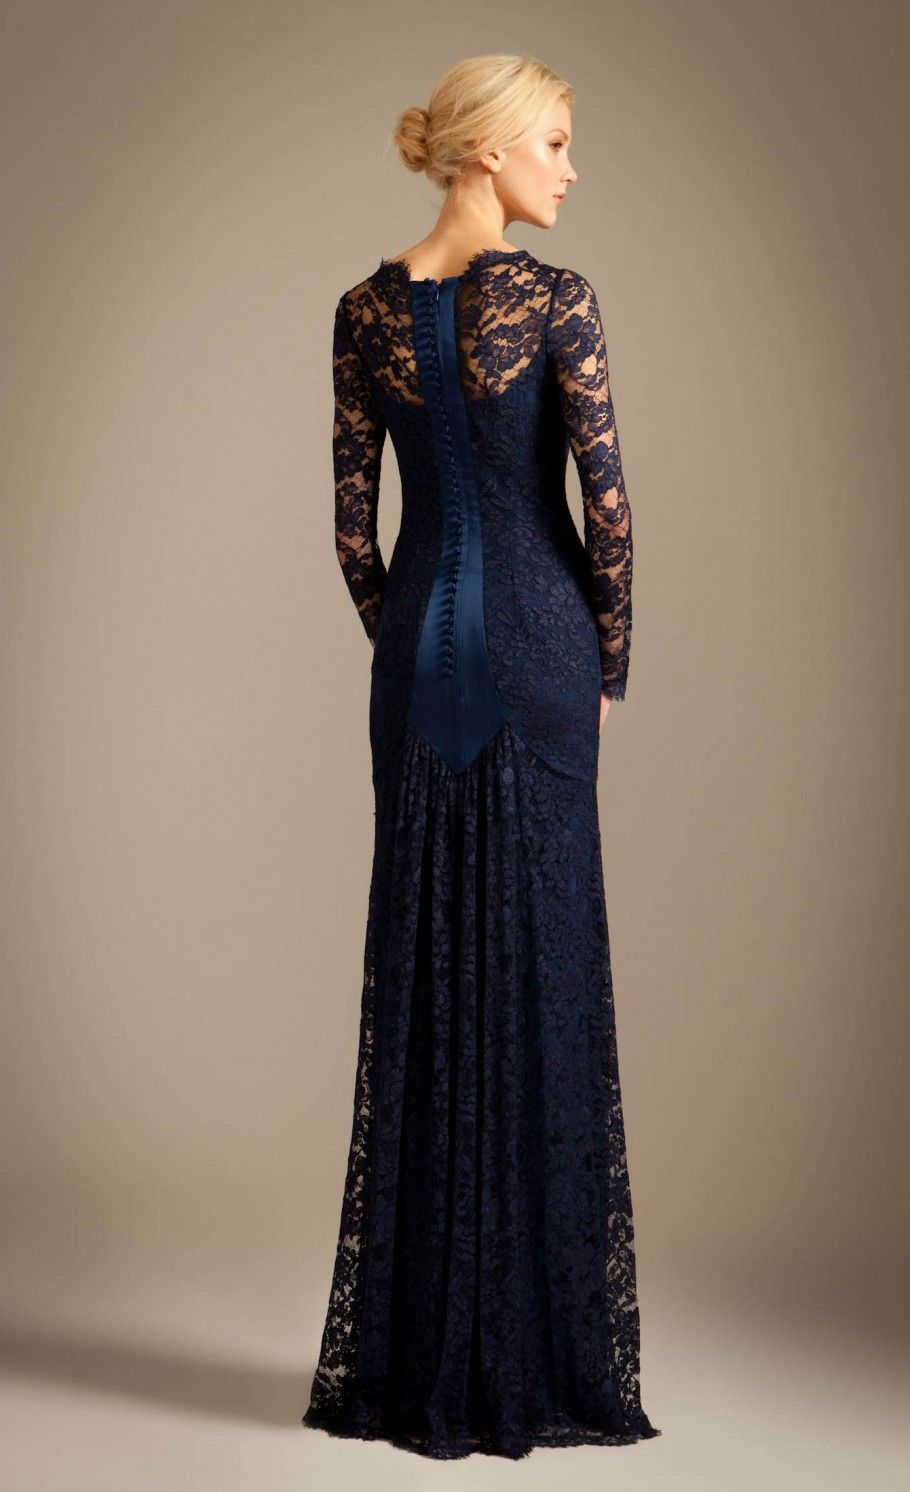 Long Cleo Lace Dress | Lace Evening Dress | Temperley London ...